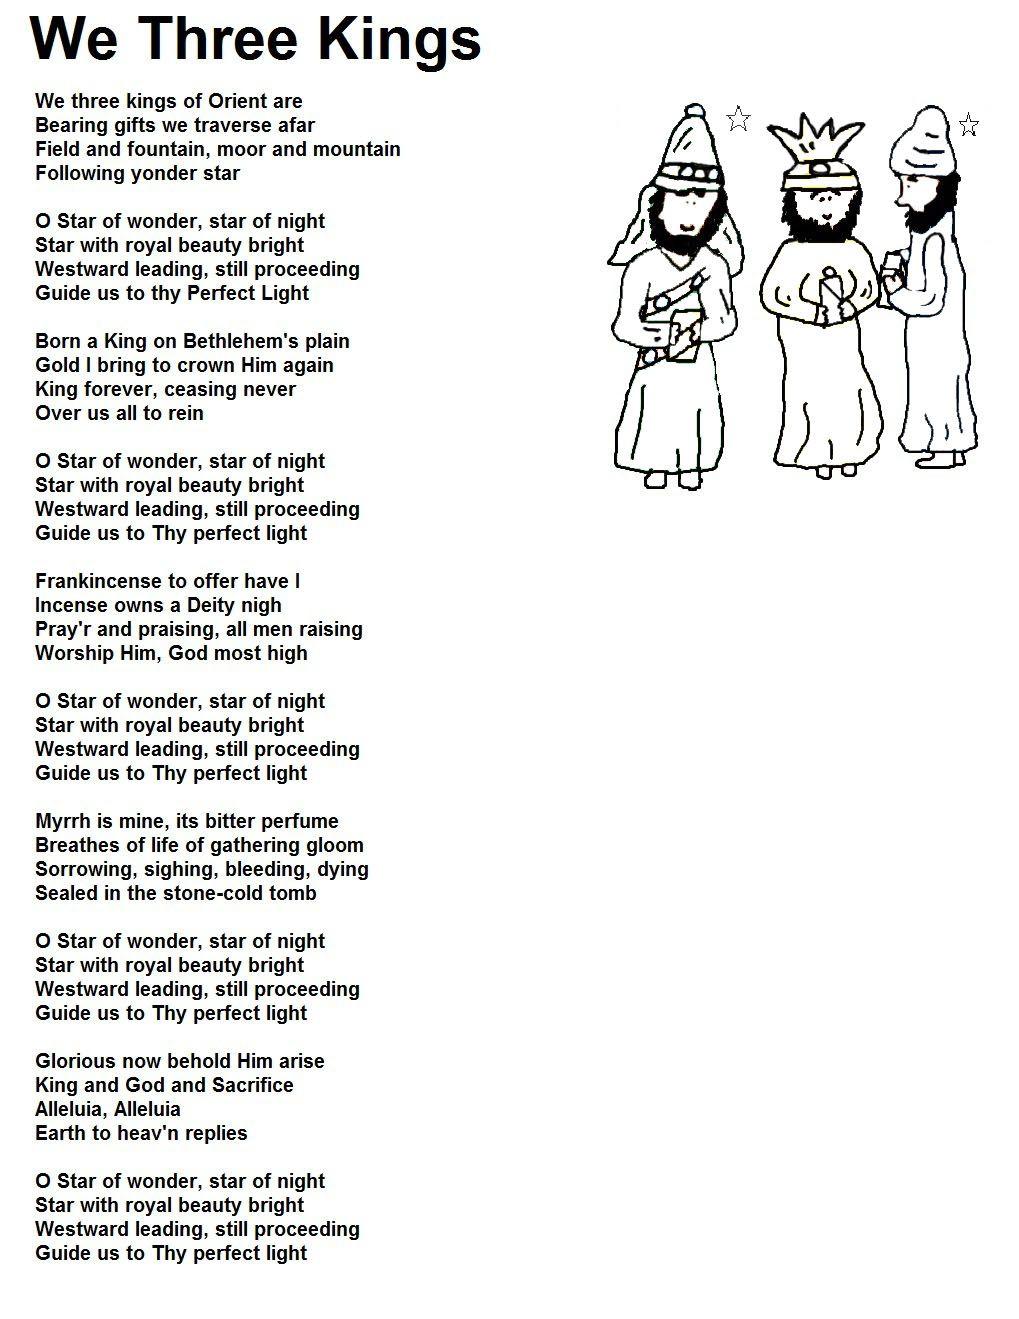 We three kings | Christmas Sheet Music, Music, Lyrics, Poems ...